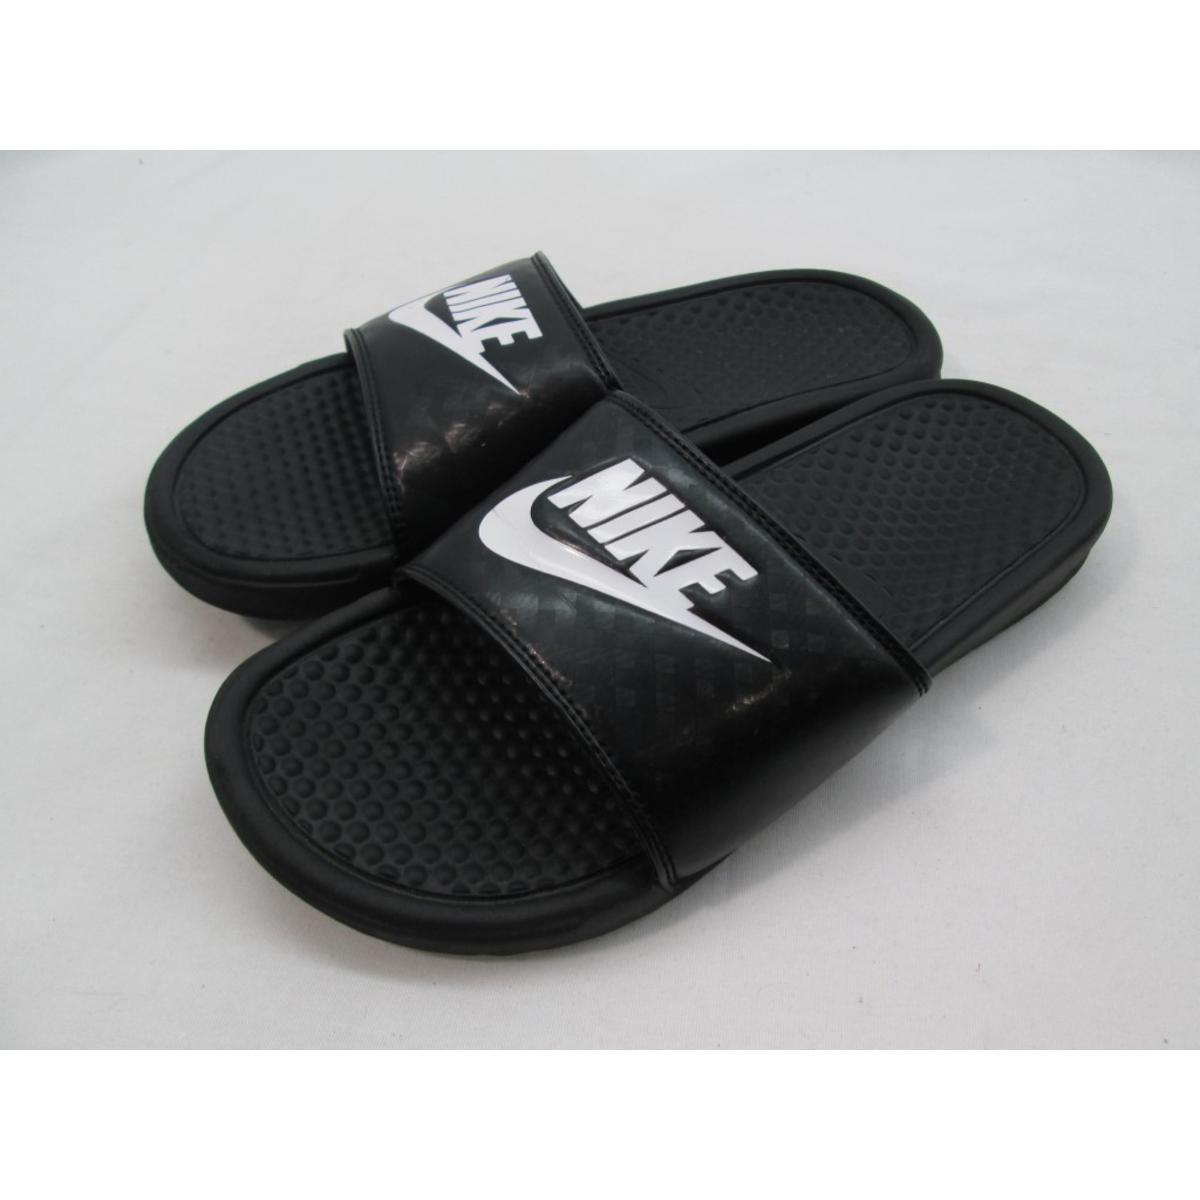 d2d64cbf215d Details about Nike Black Benassi Swoosh Unisex Slide Sandal Men s 9 Women s  10